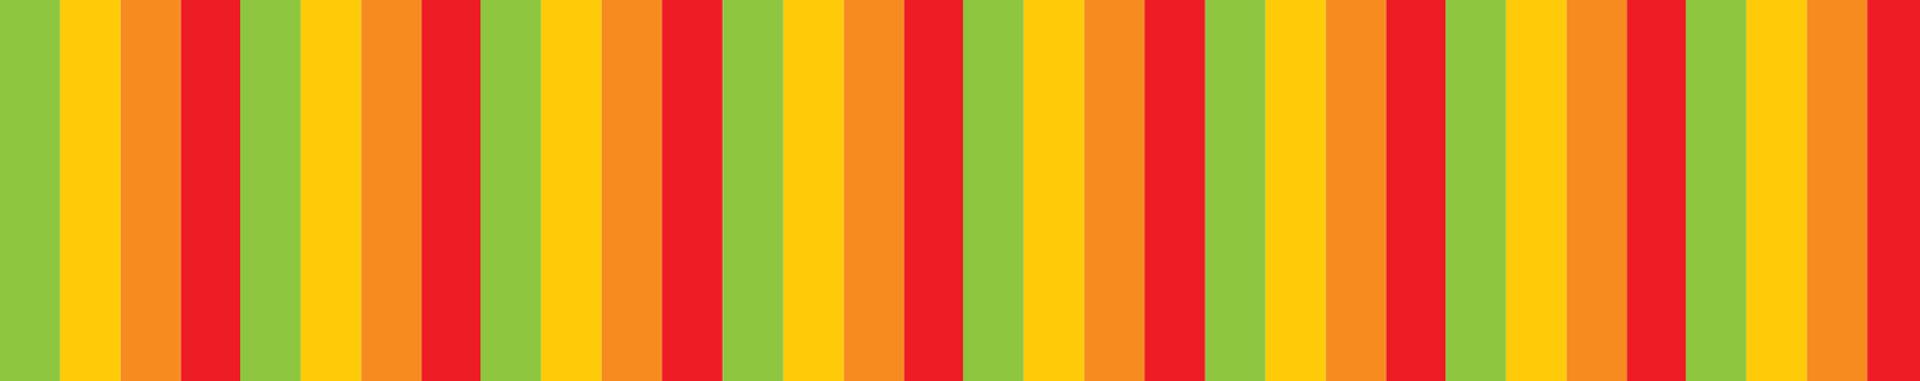 pegamento de contacto vl 2000 franja colores - PEGAMENTO BLANCO